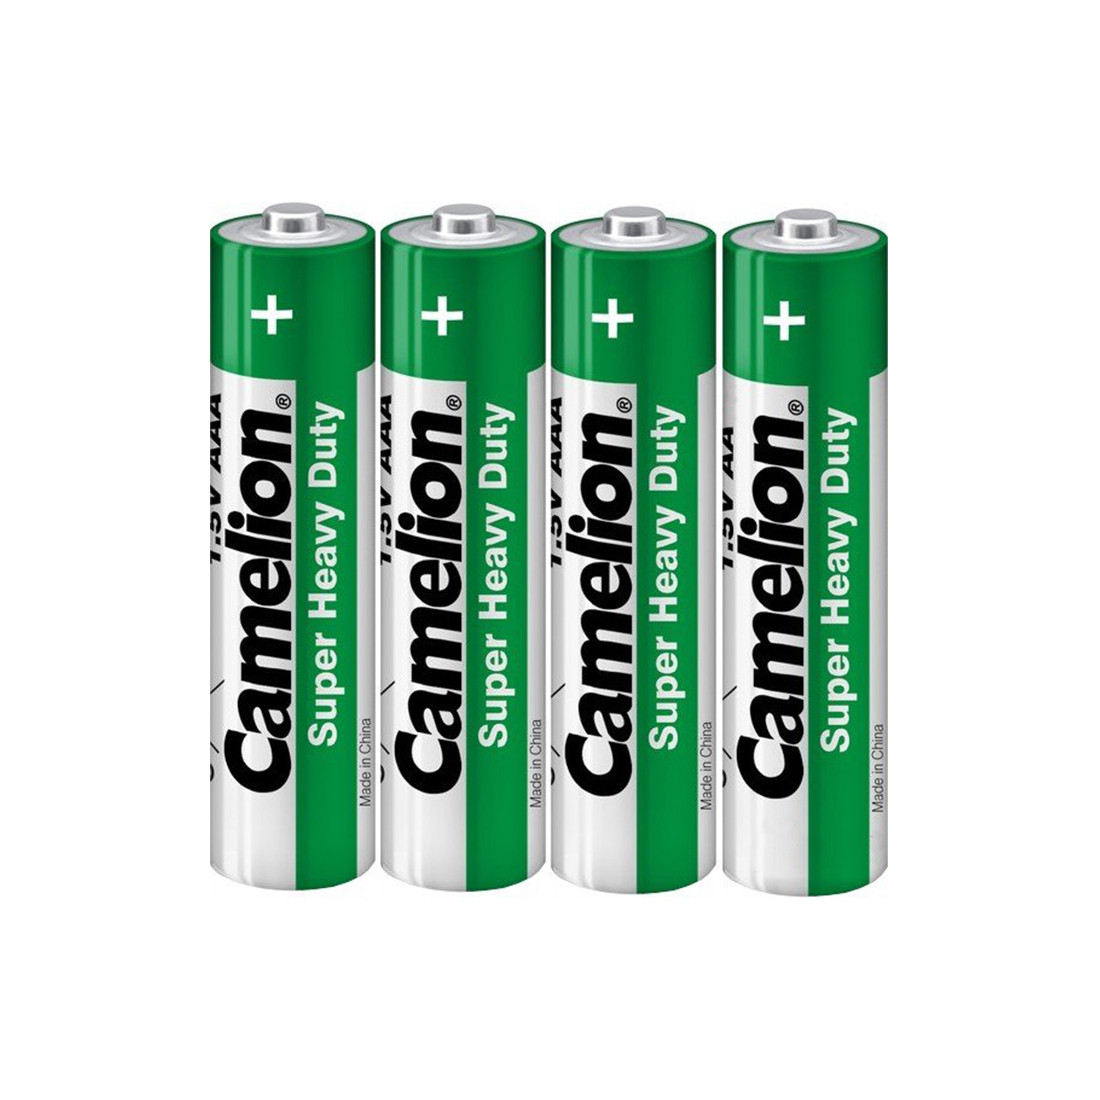 Батарейка, CAMELION, R03P-SP4G, Солевая,Super Heavy Duty, AAA, 1.5V, 4 шт., Плёнка